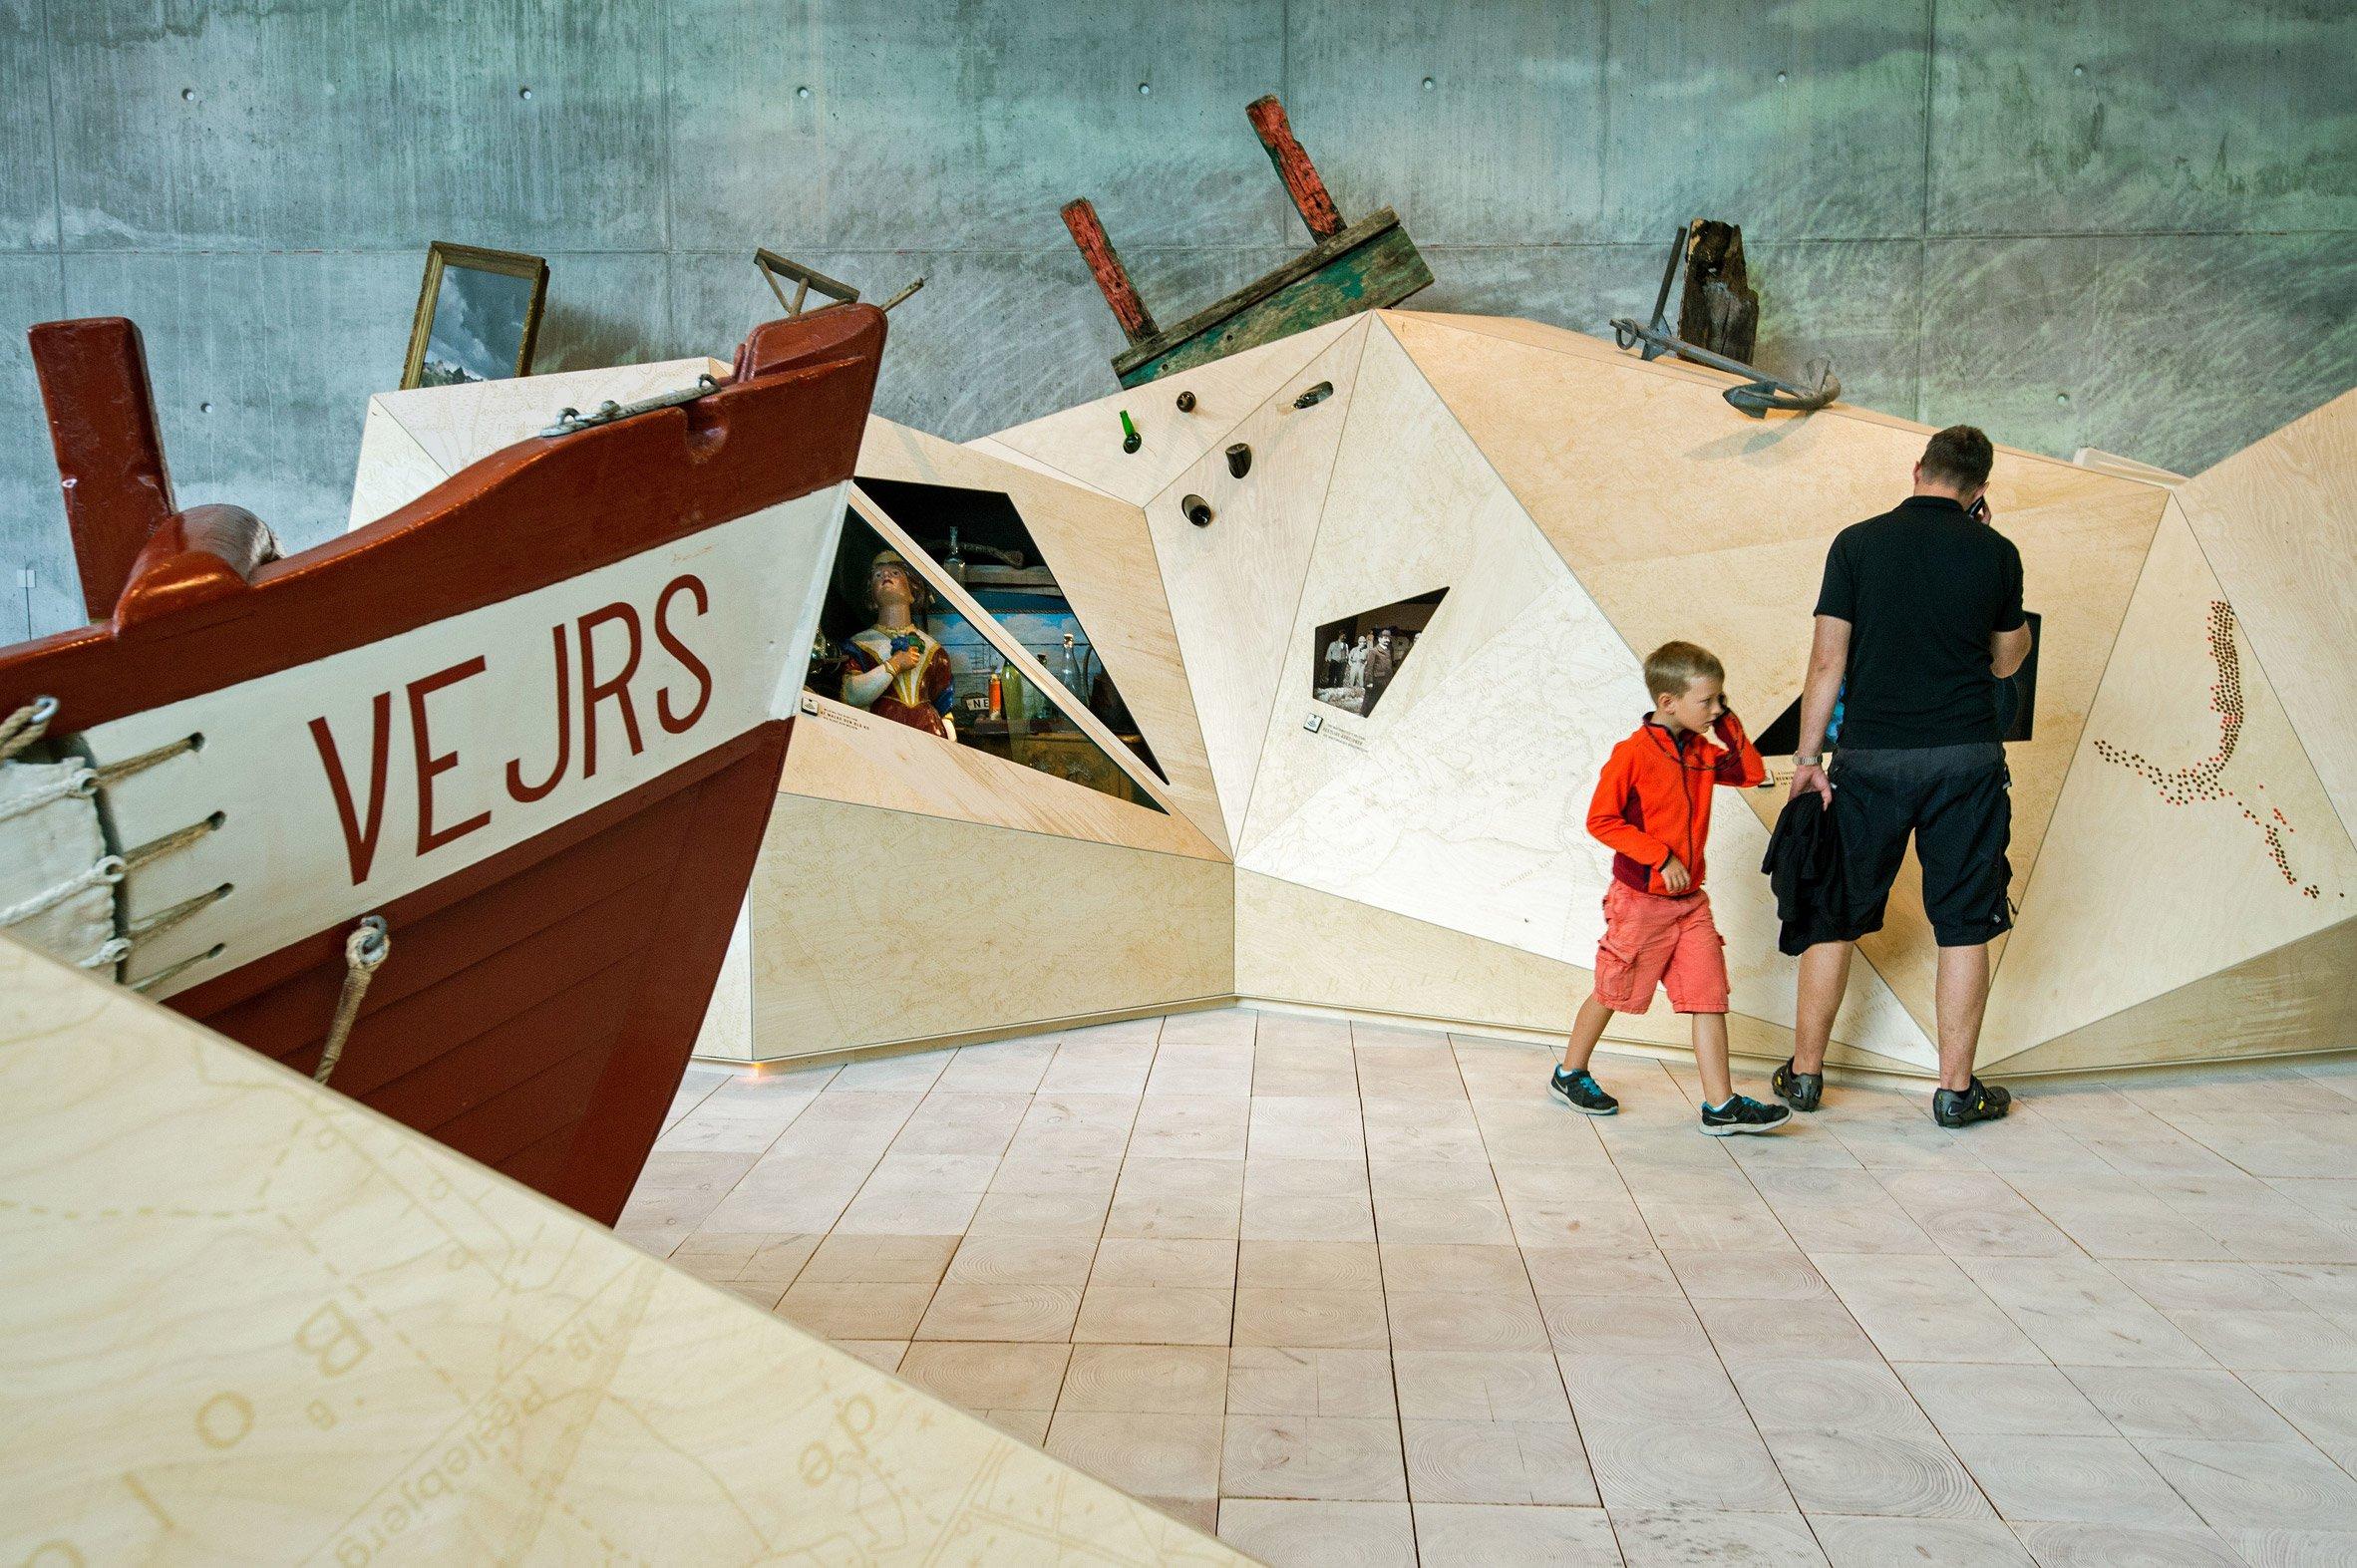 tirpitz-big-news-architecture-cultural-museum-denmark-_dezeen_2364_col_8-1